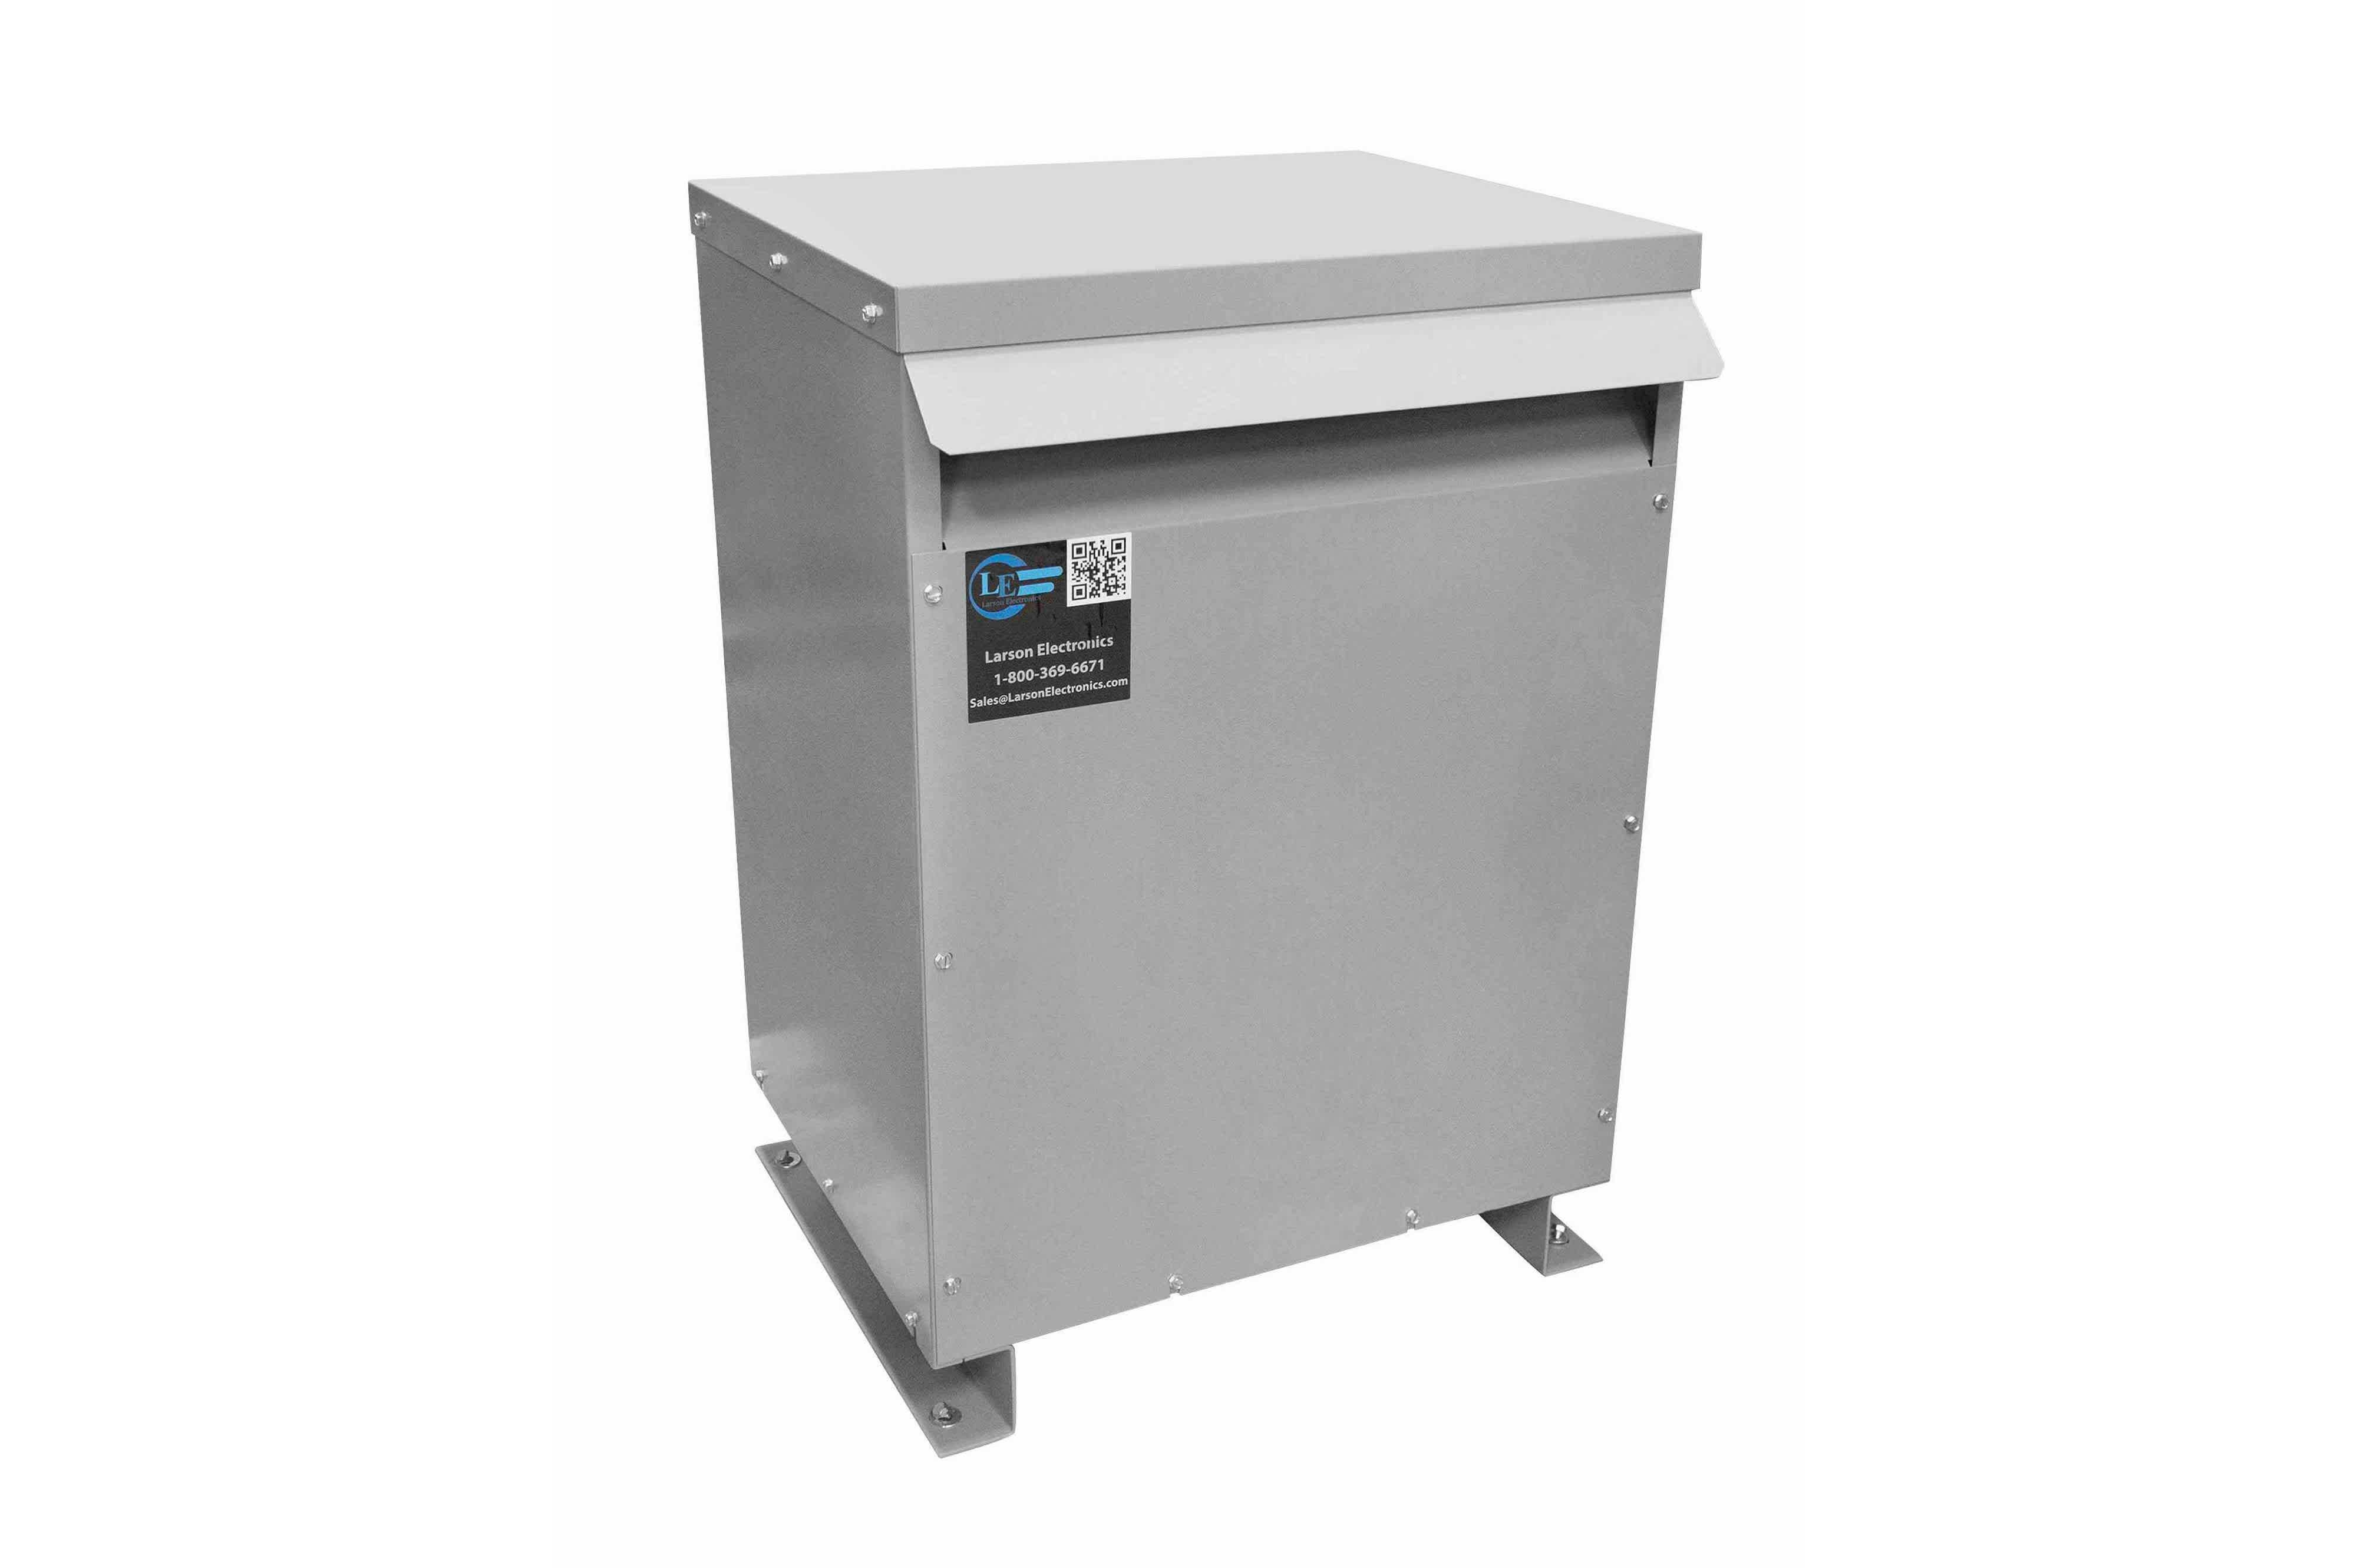 100 kVA 3PH Isolation Transformer, 480V Wye Primary, 380V Delta Secondary, N3R, Ventilated, 60 Hz